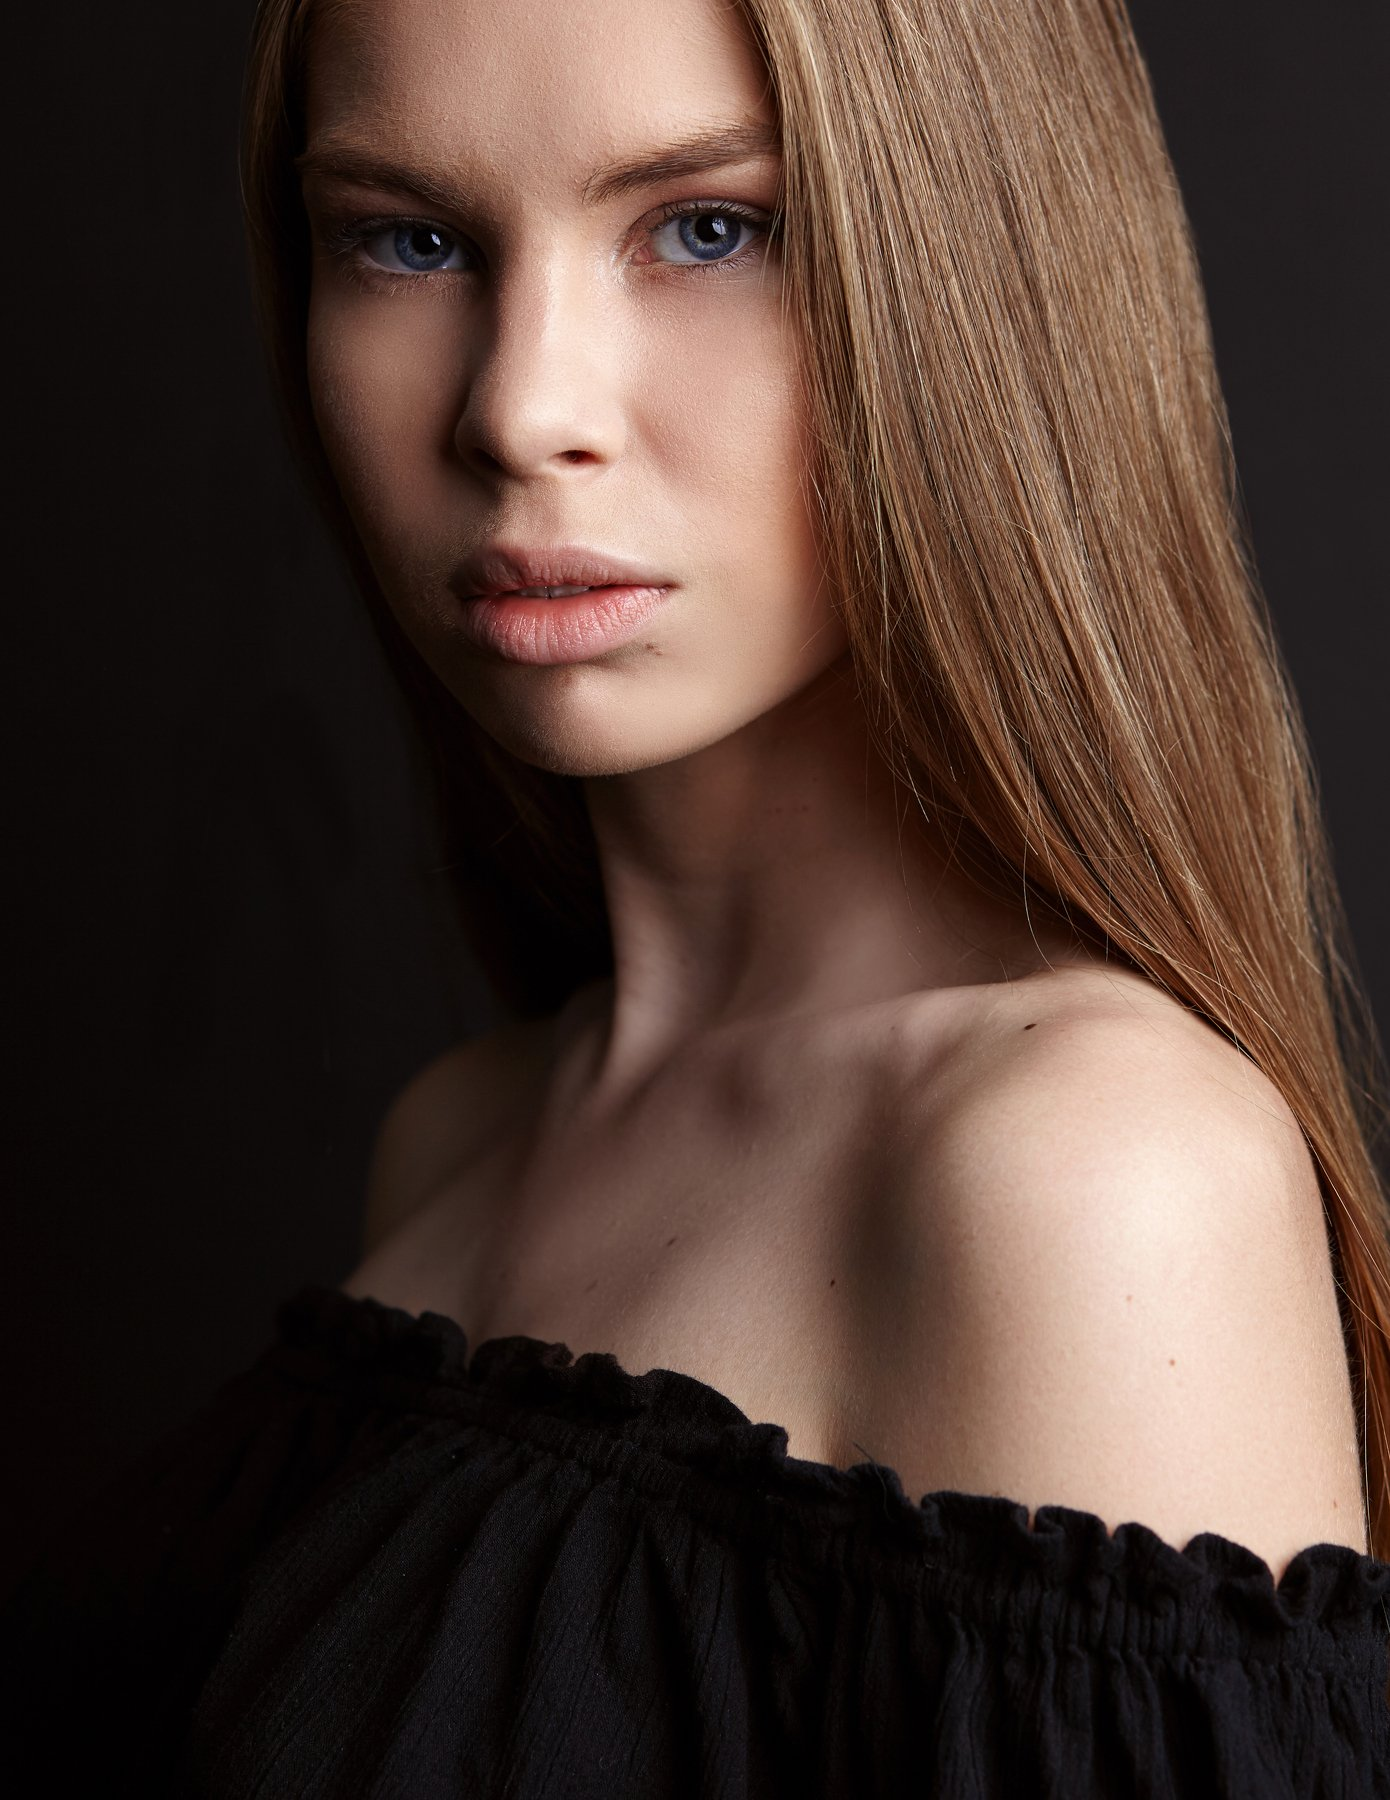 Beautiful, Girl, Lips, People, portrait, Studio, портрет, Адиль Исаев